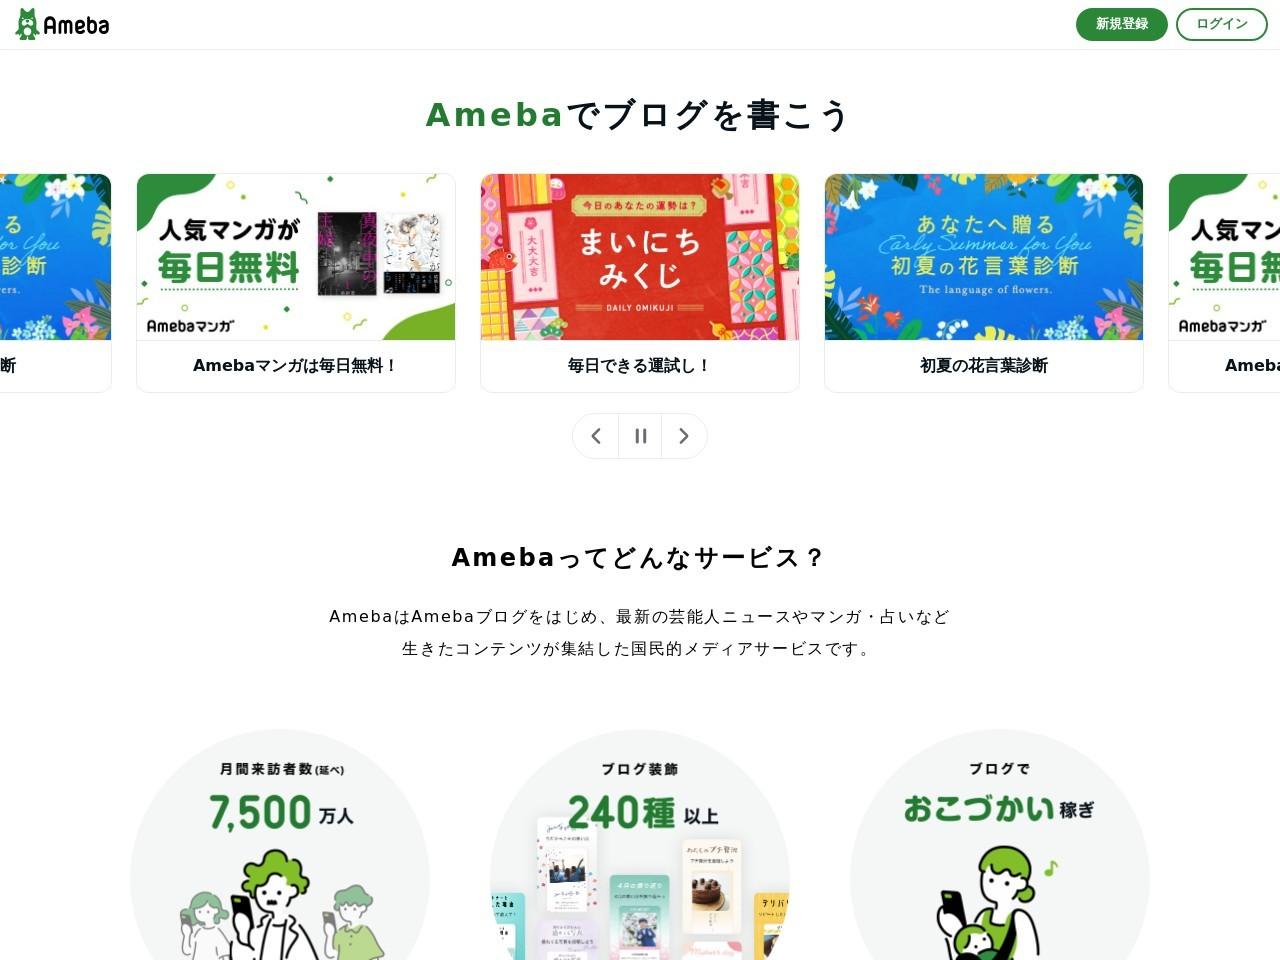 https://ameblo.jp/maidspa/entry-12442579293.html